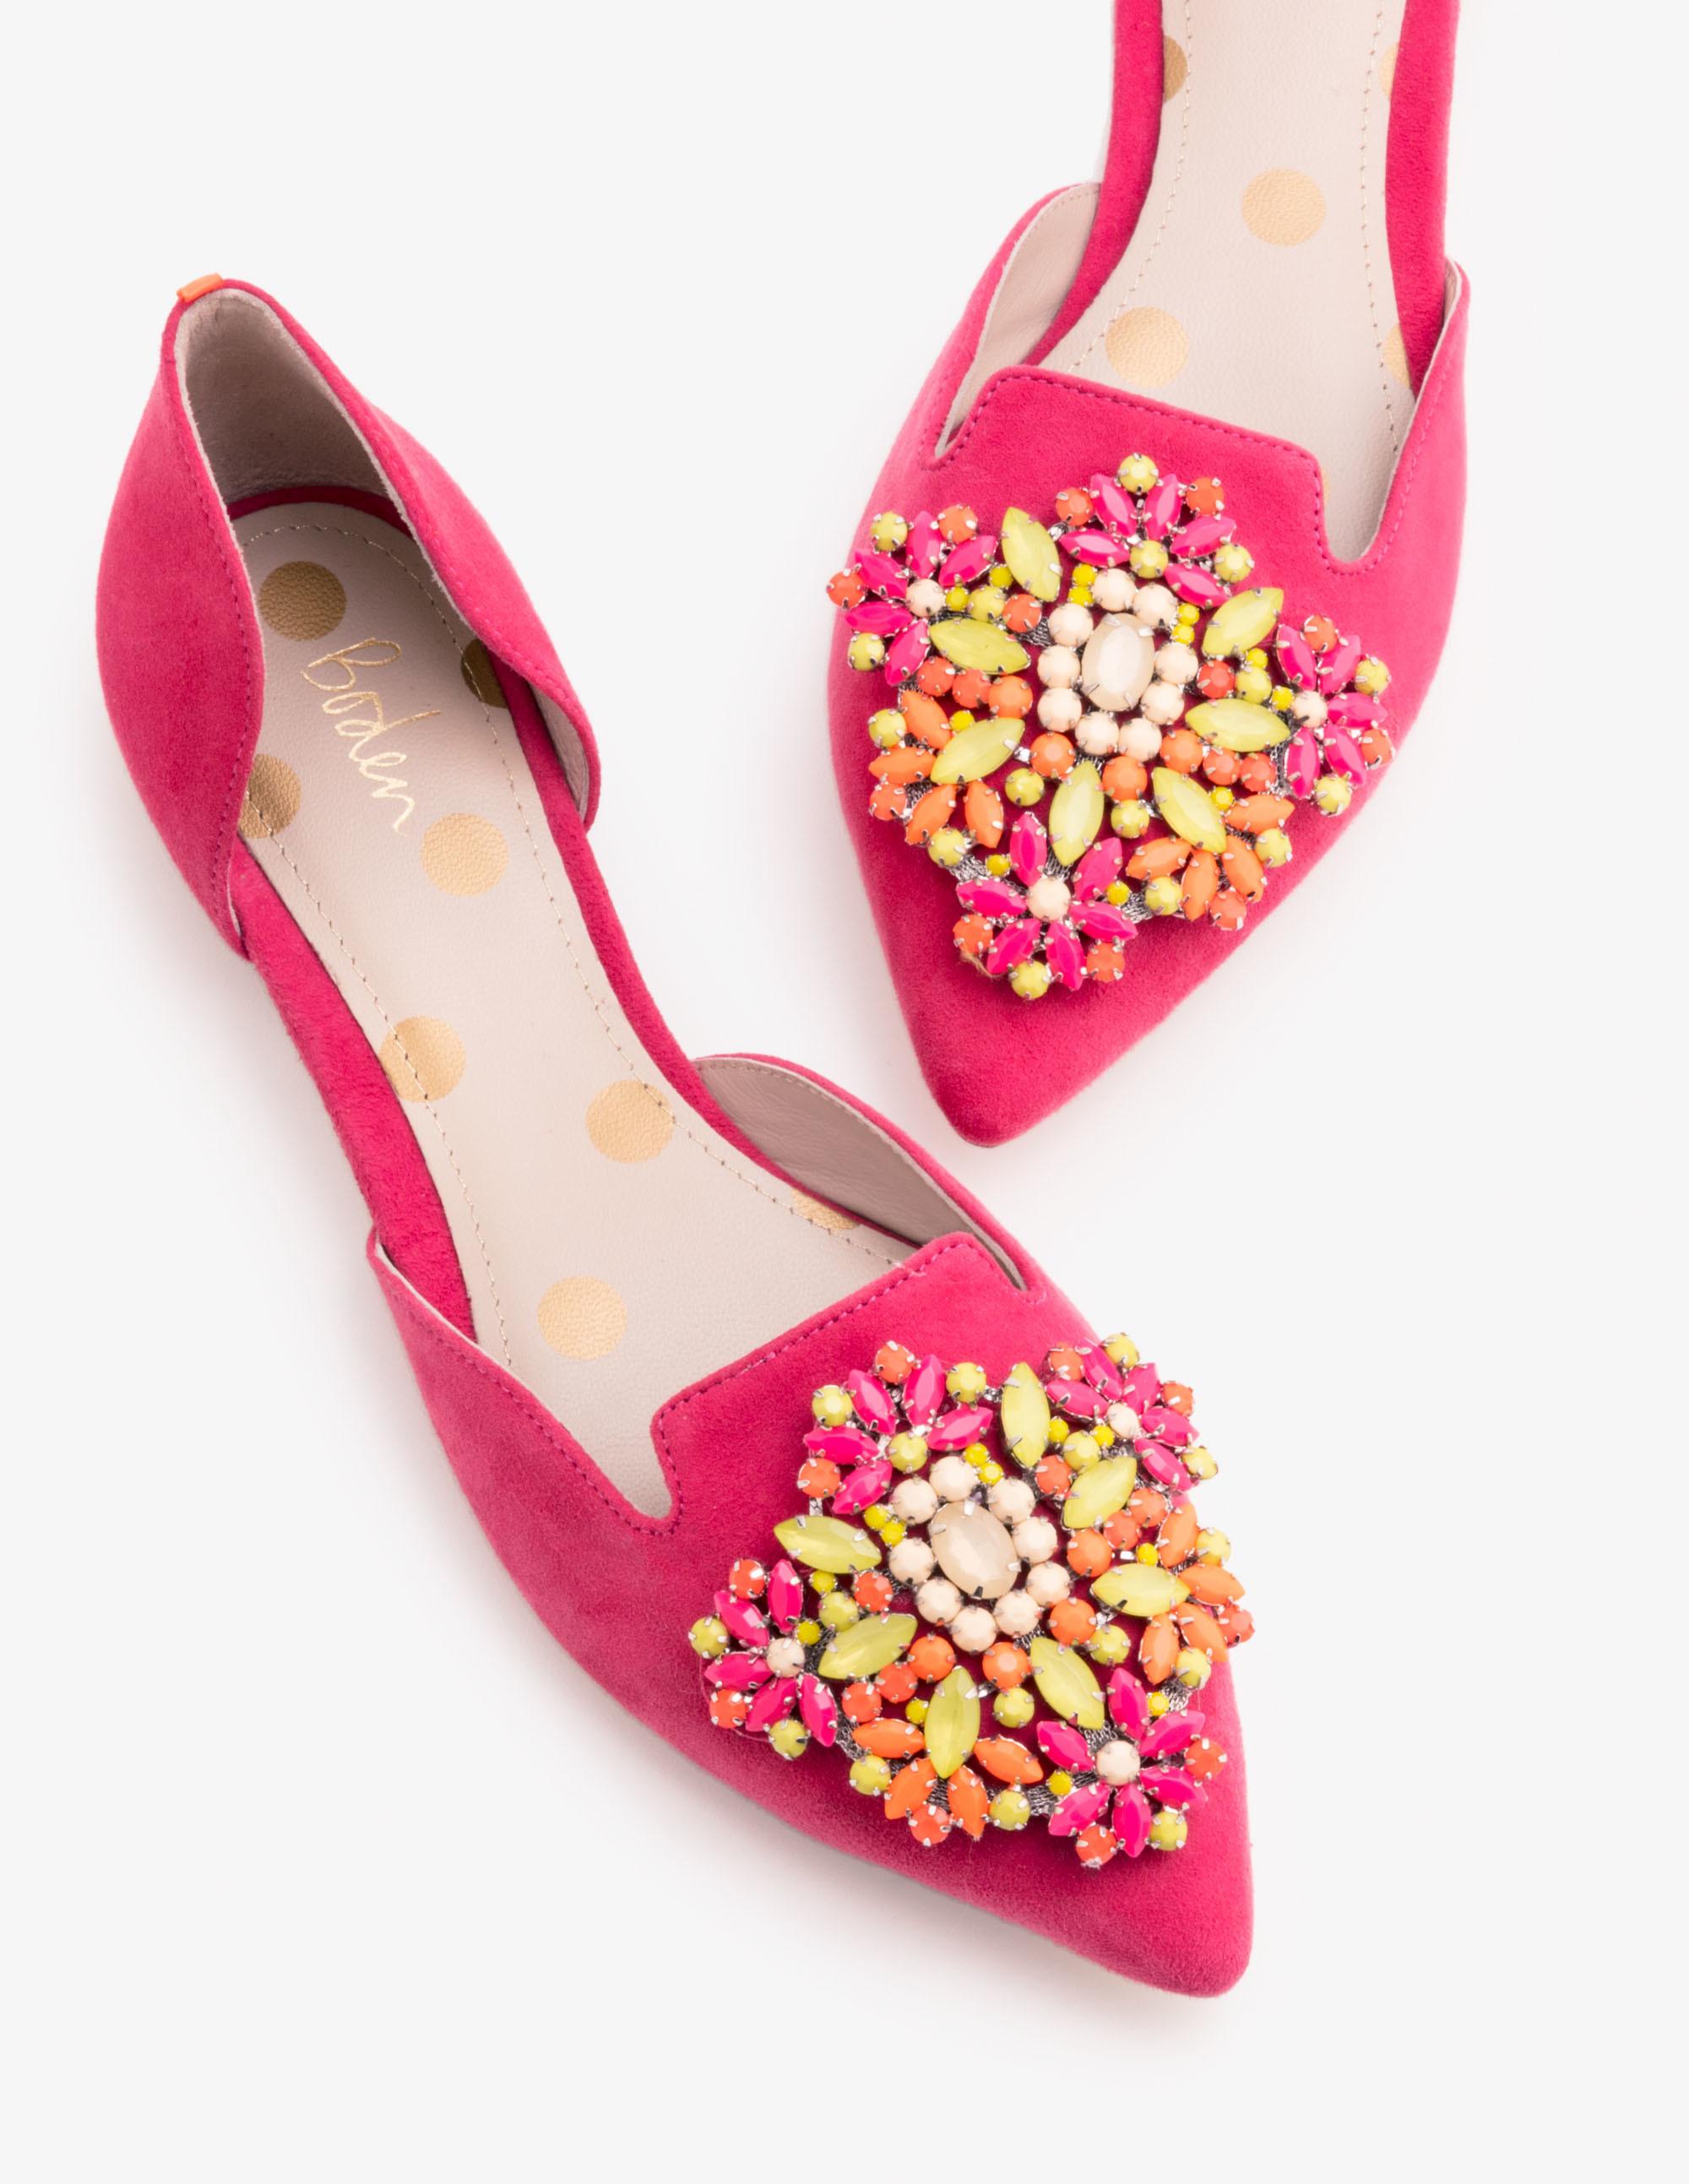 Leah Flache Schuhe mit Schmucksteinbesatz Pink Damen Boden 38 NDX0XPQ7Gg